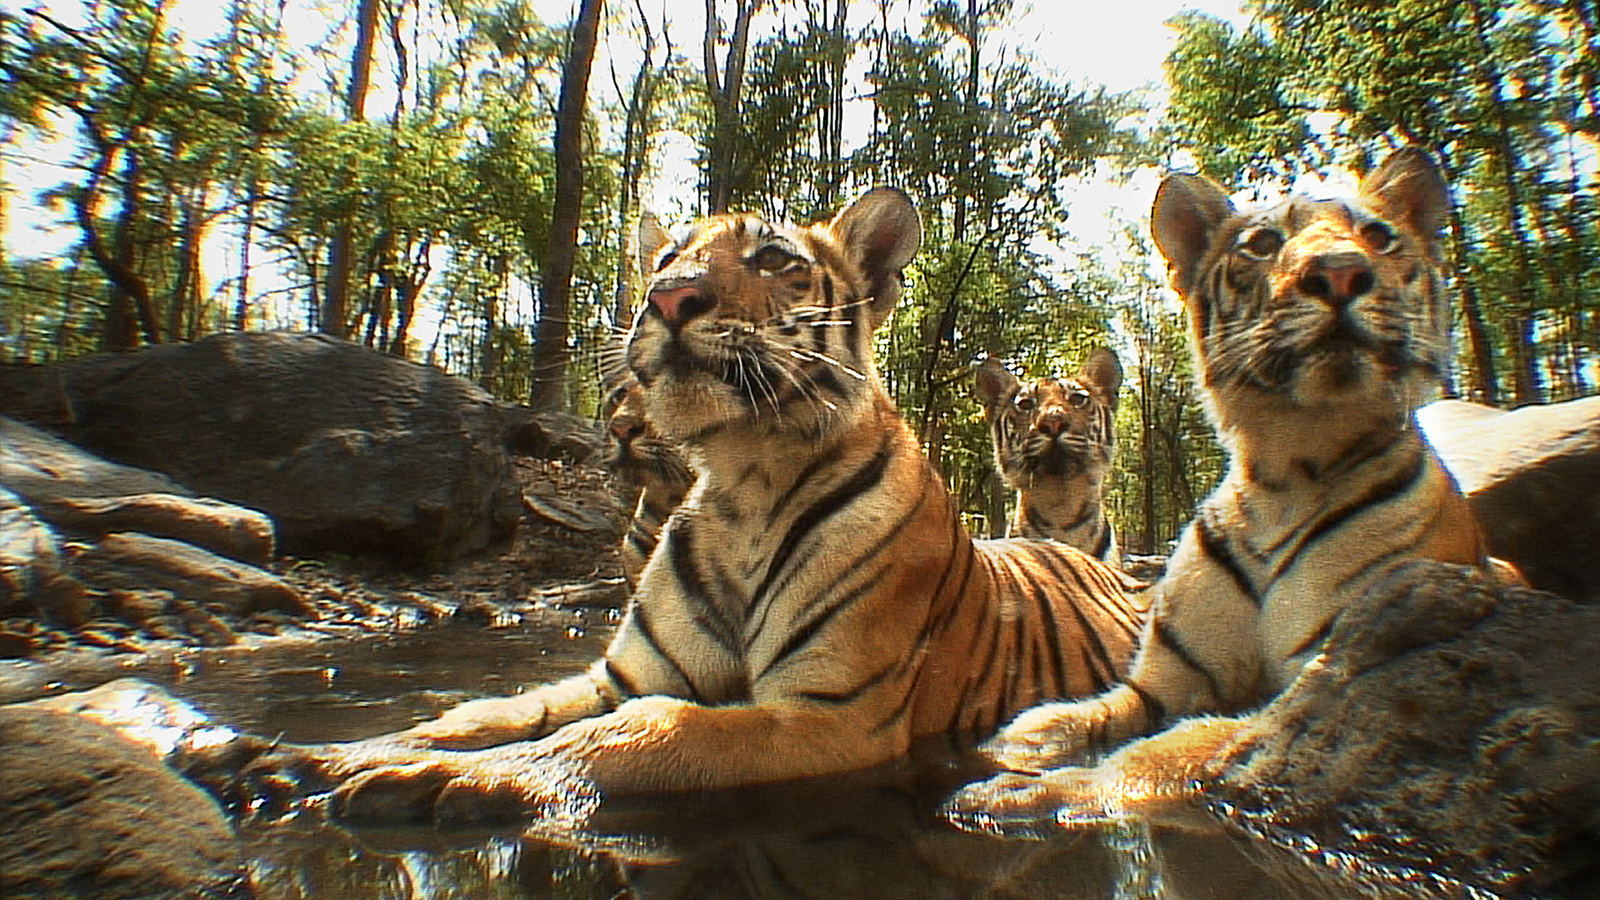 Tiger Spy In The Jungle Eden Channel